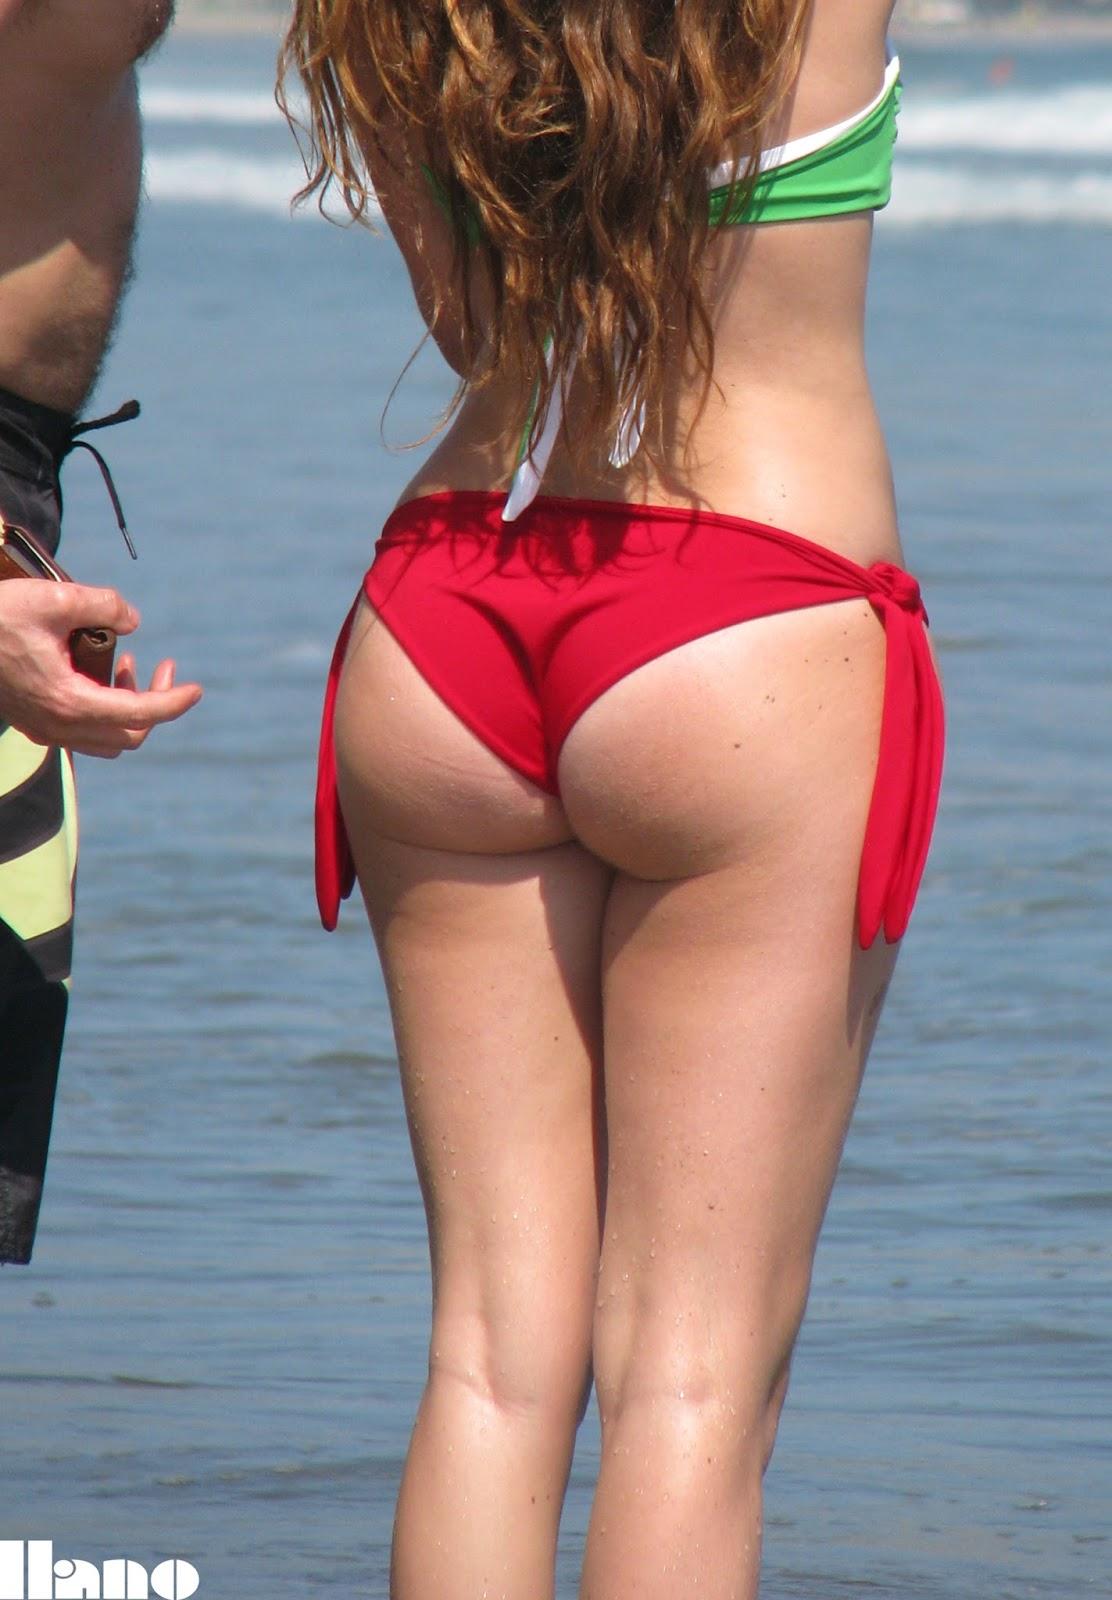 ex gf nude booty